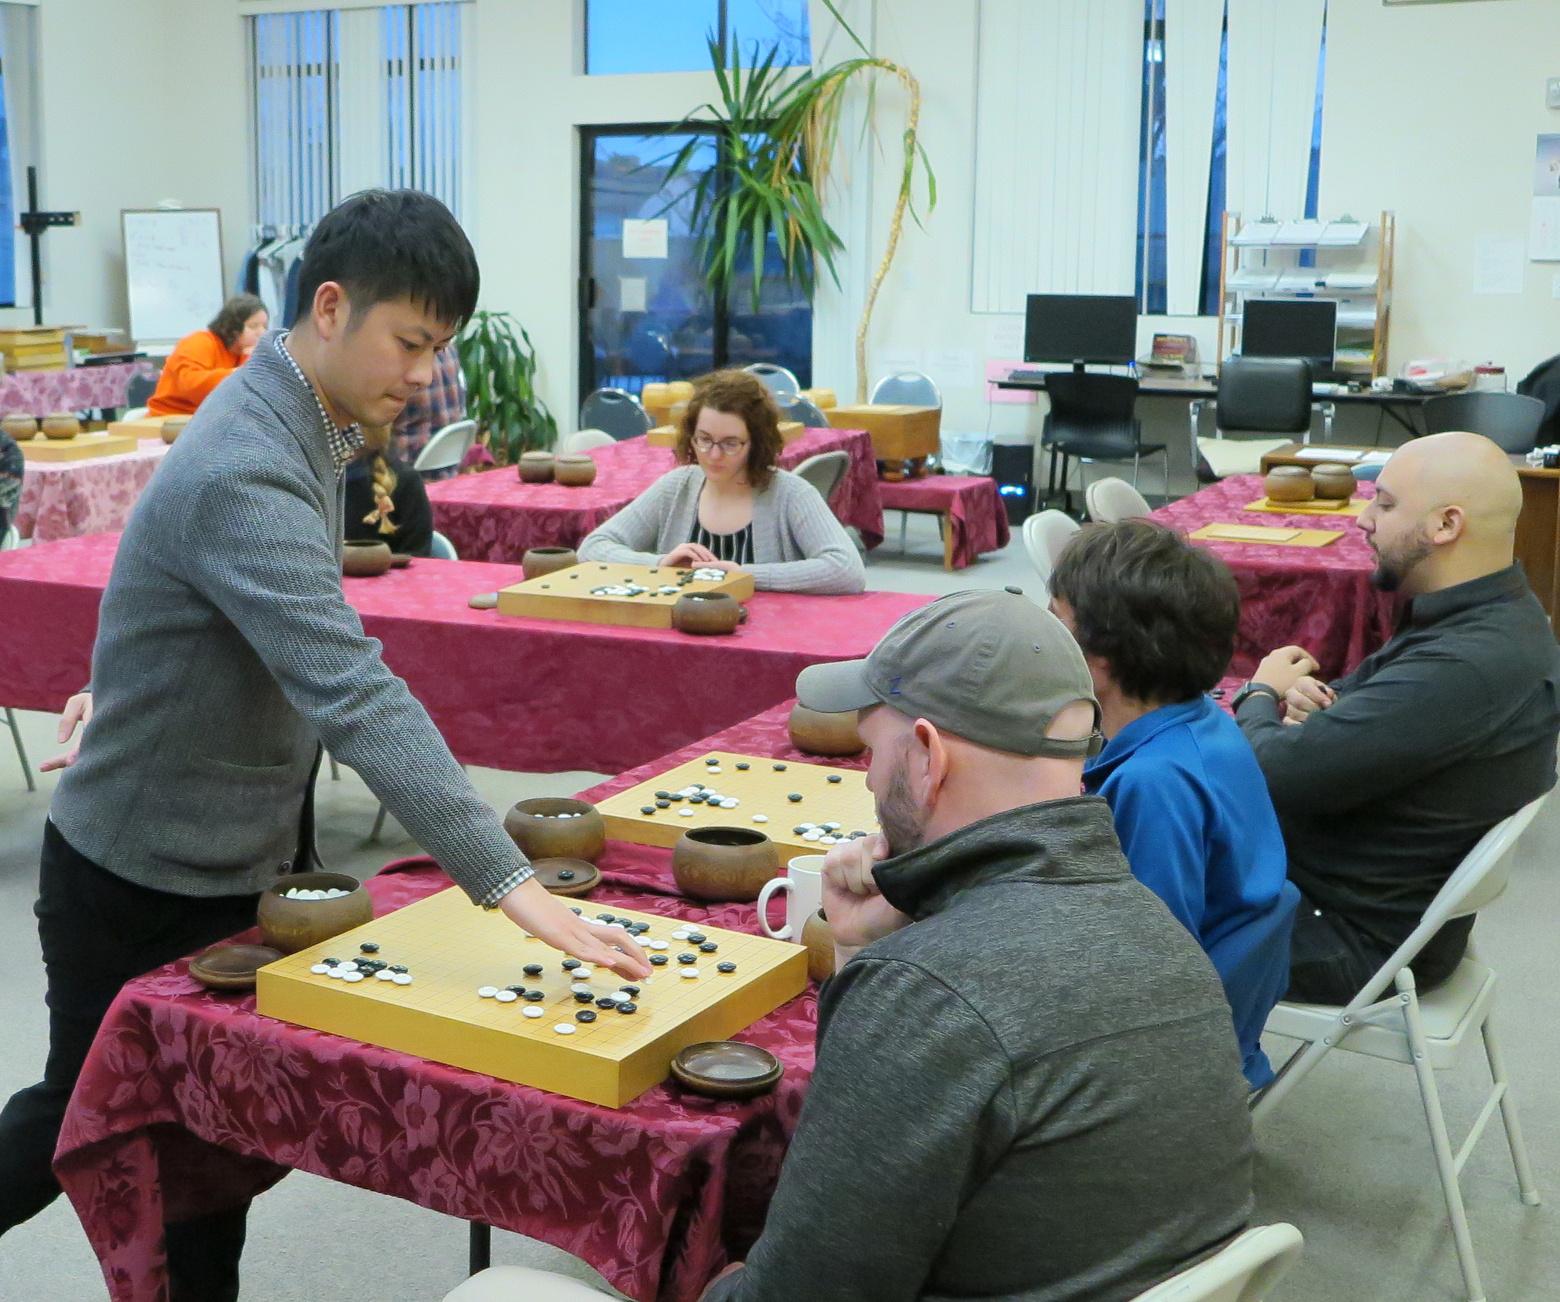 Daiki Komatsu 3 Dan battles multiple Go players.